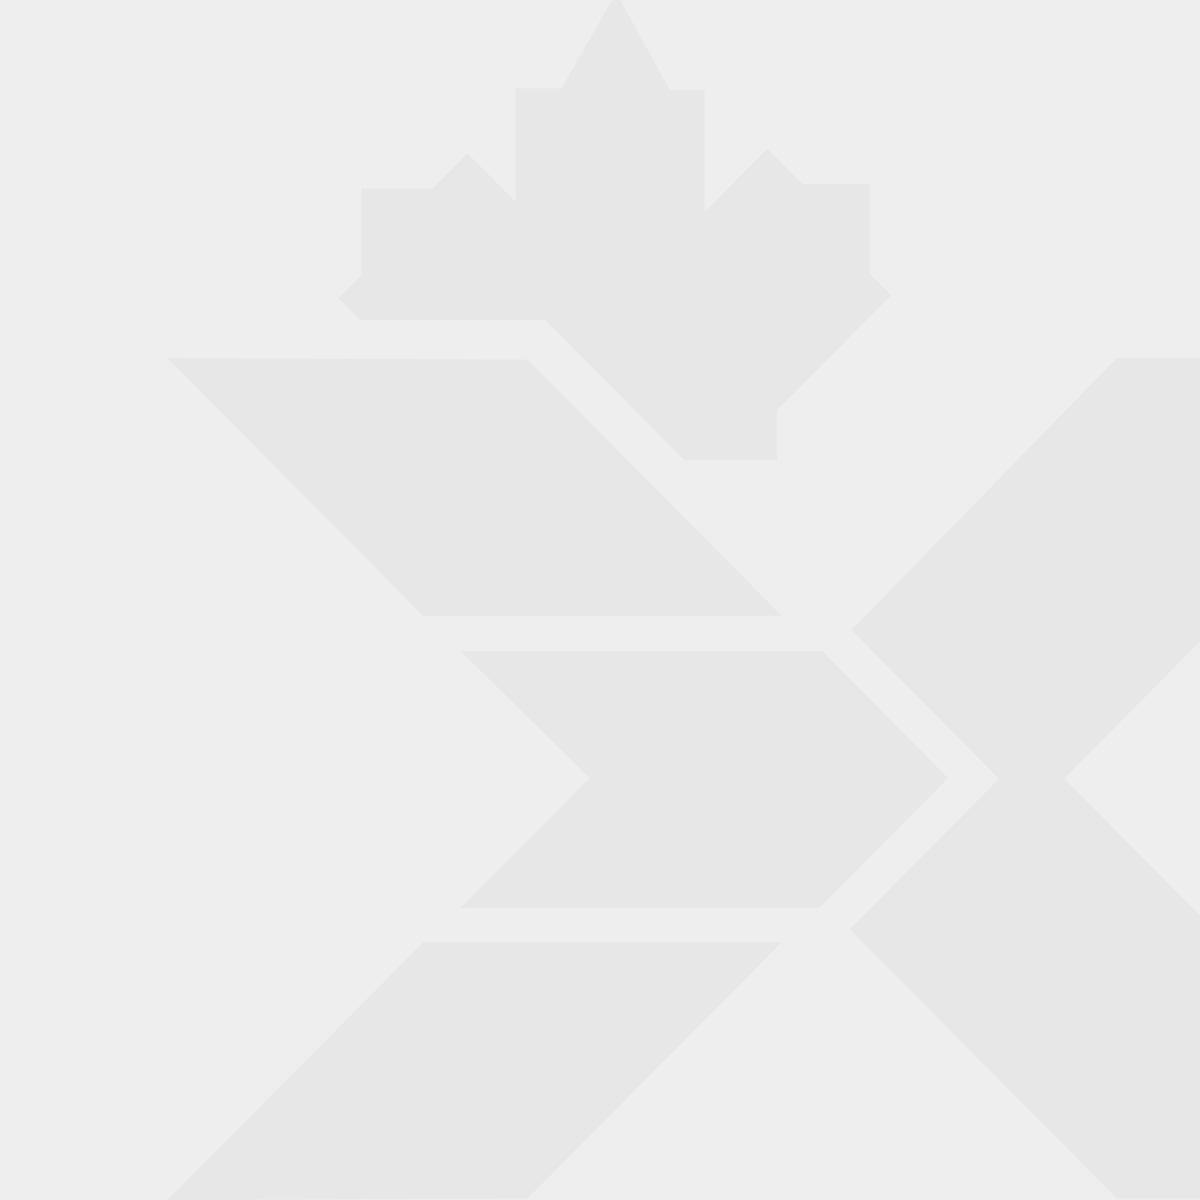 First Tactical Men's V2 Tactical Pant Blue